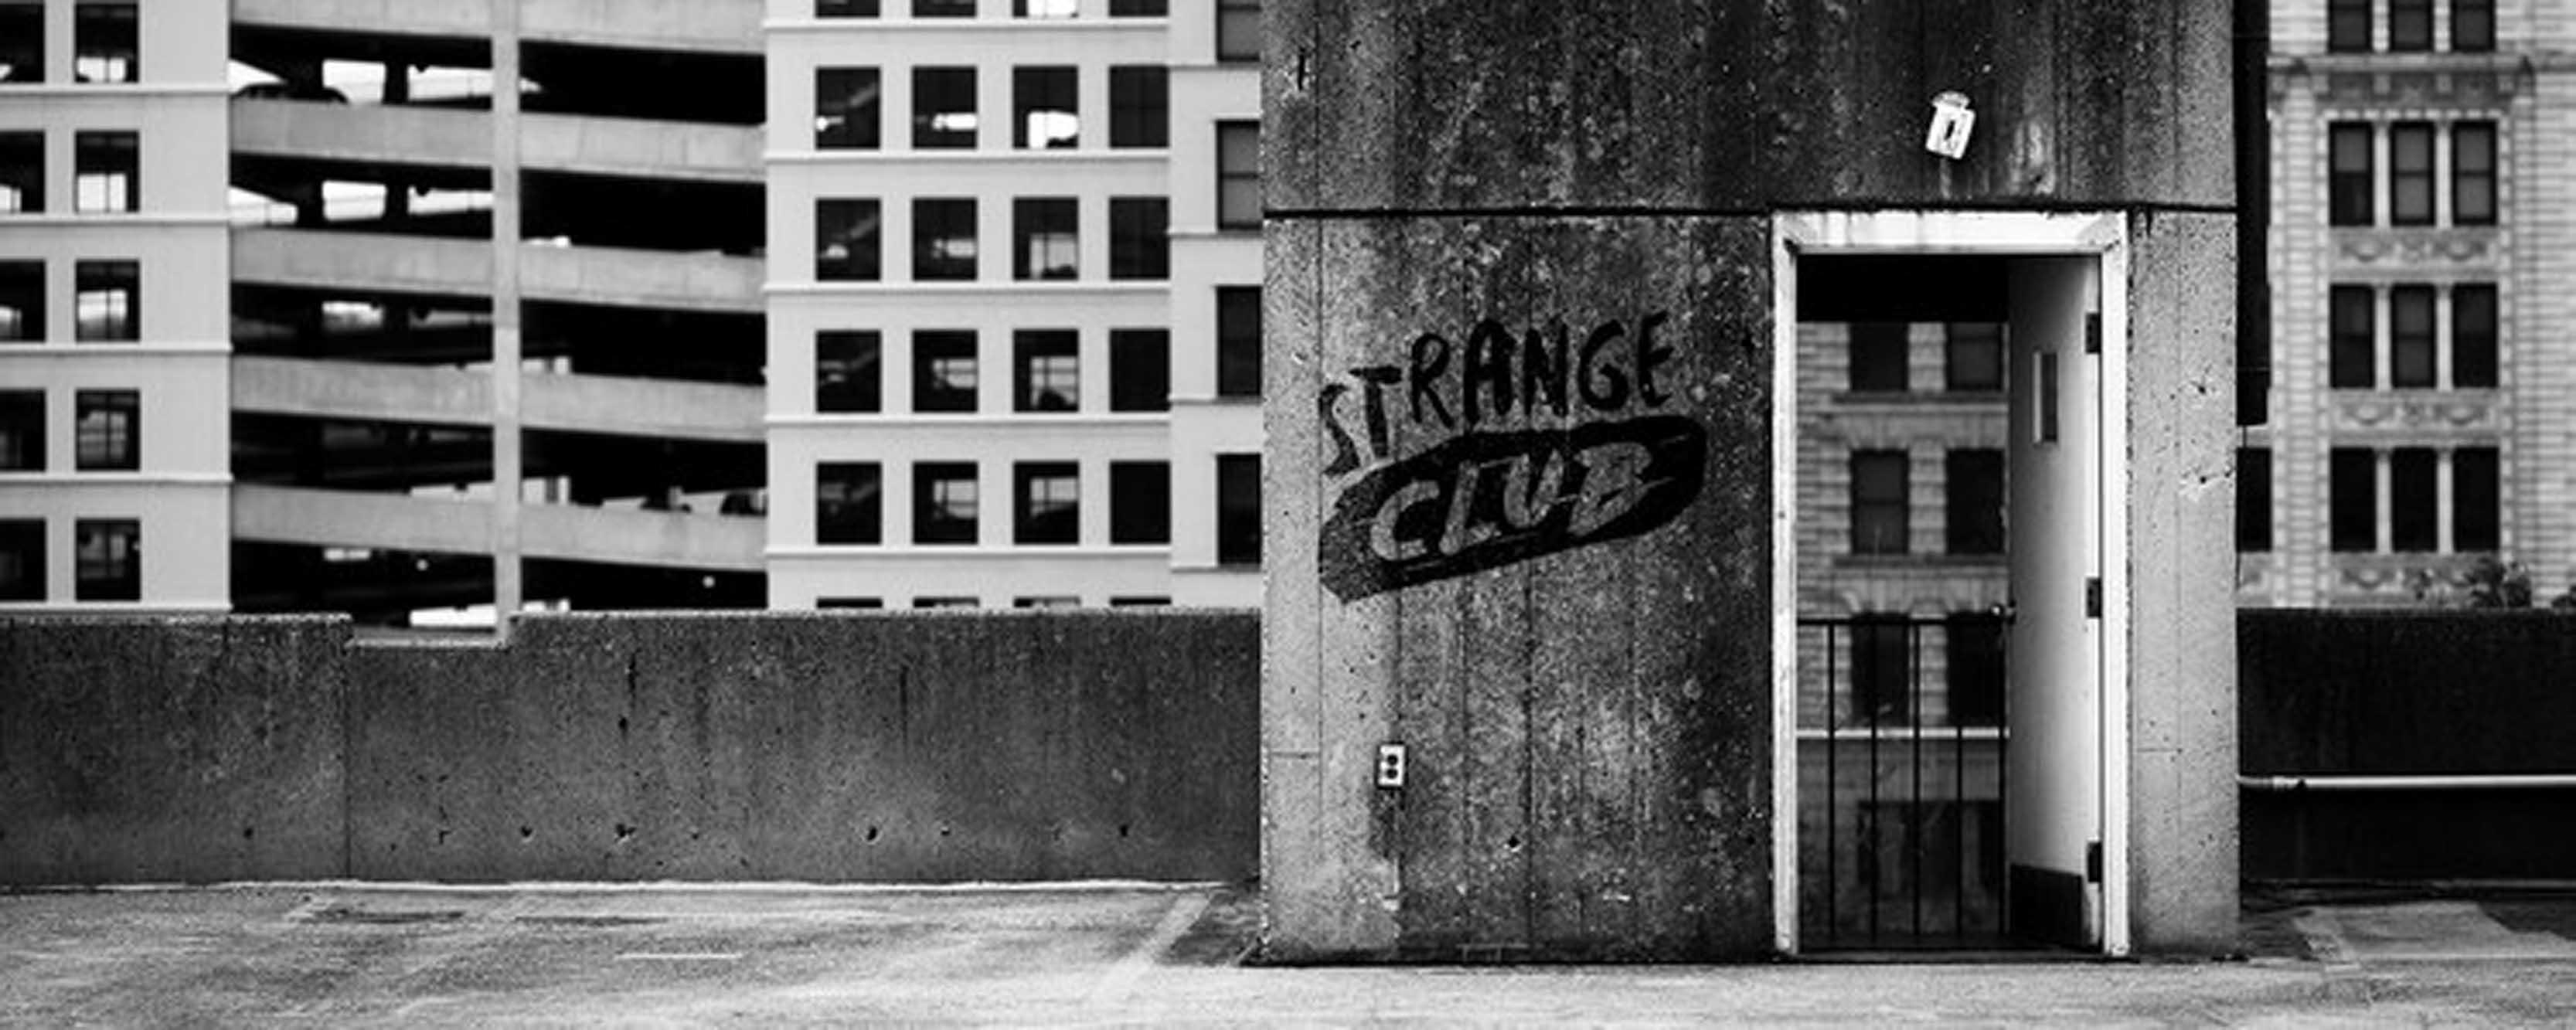 str club